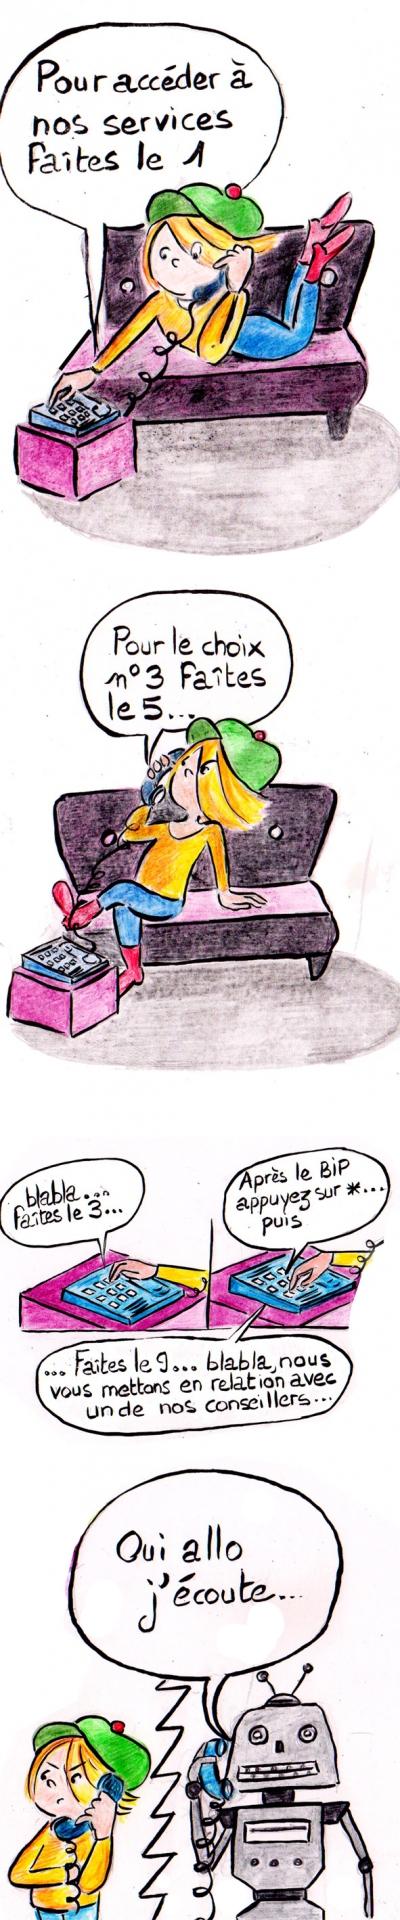 webzine,bd,zébra,gratuit,fanzine,bande-dessinée,strip,lola,ultra-book,aurelie dekeyser